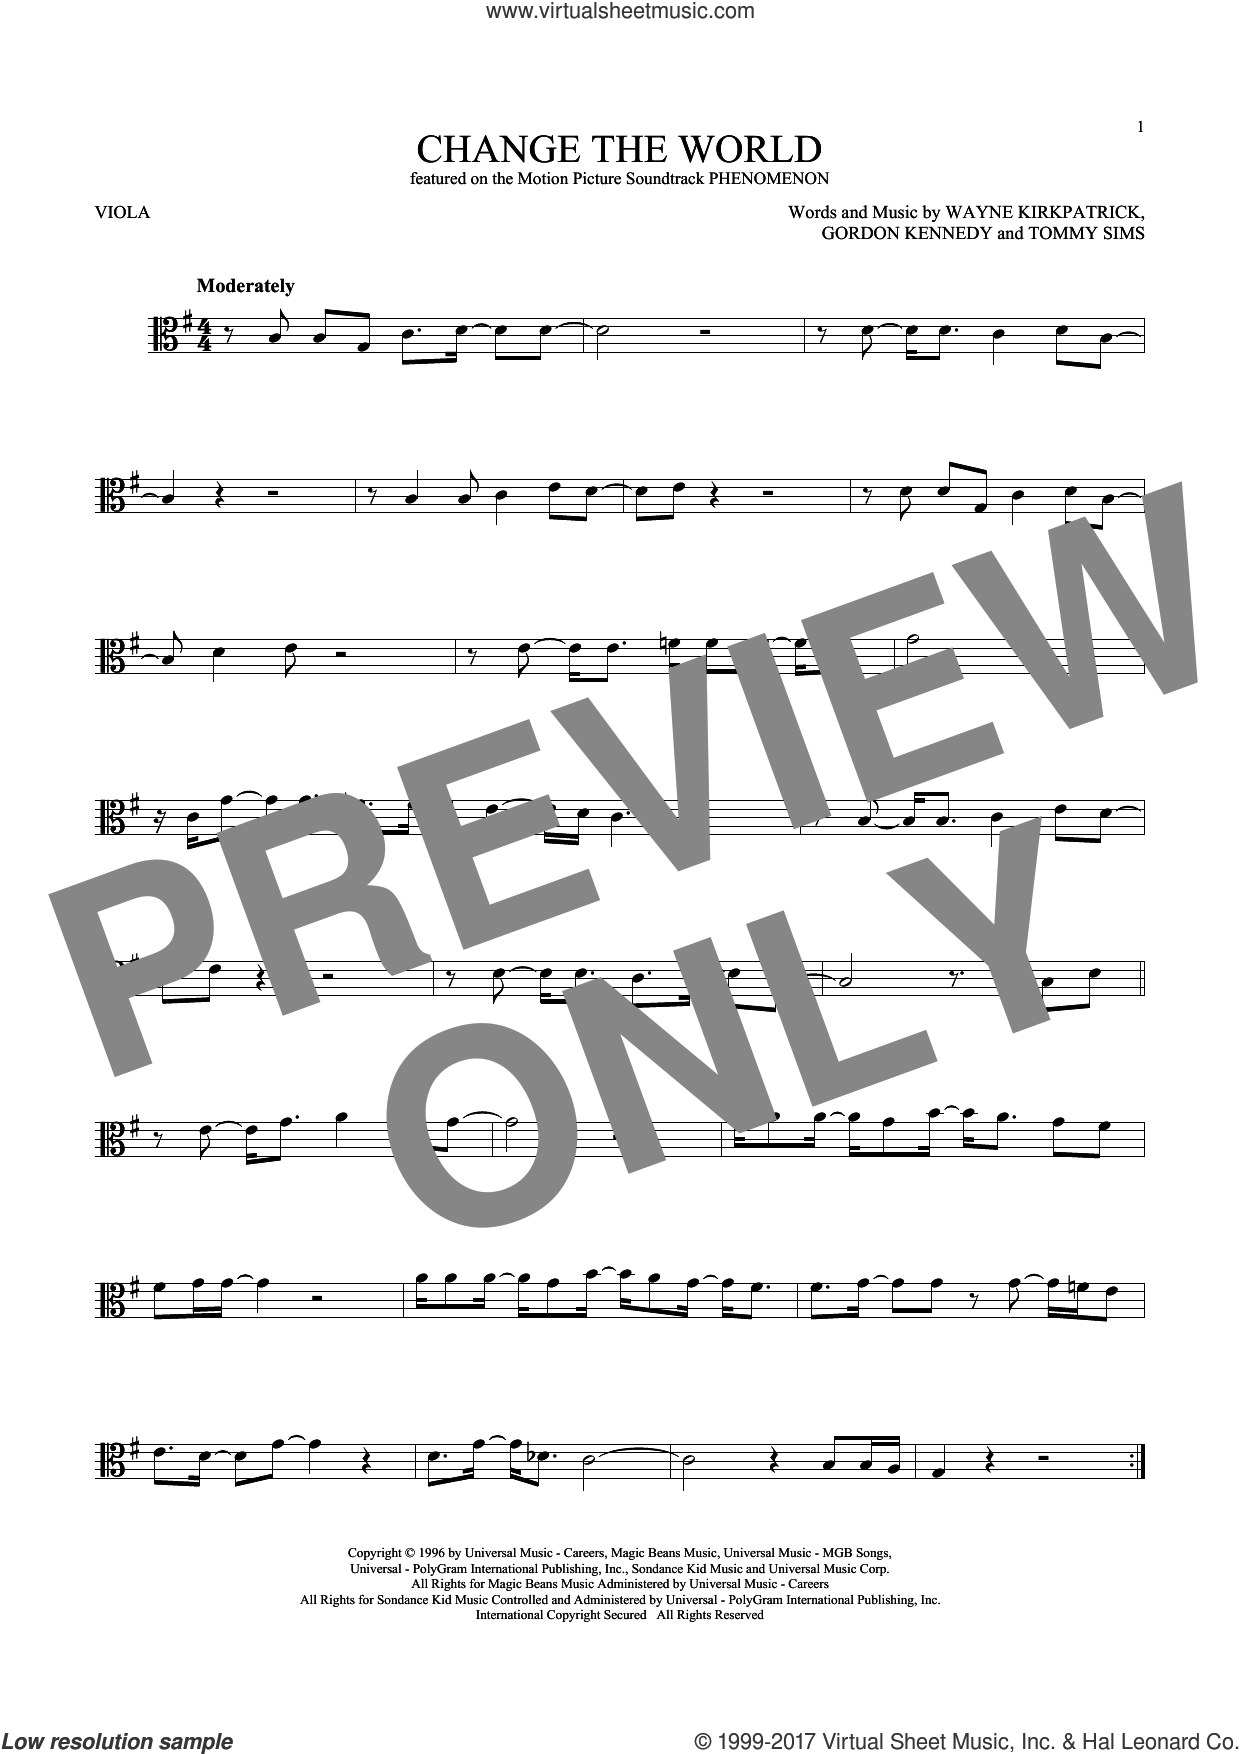 Change The World sheet music for viola solo by Eric Clapton, Wynonna, Gordon Kennedy, Tommy Sims and Wayne Kirkpatrick, intermediate skill level